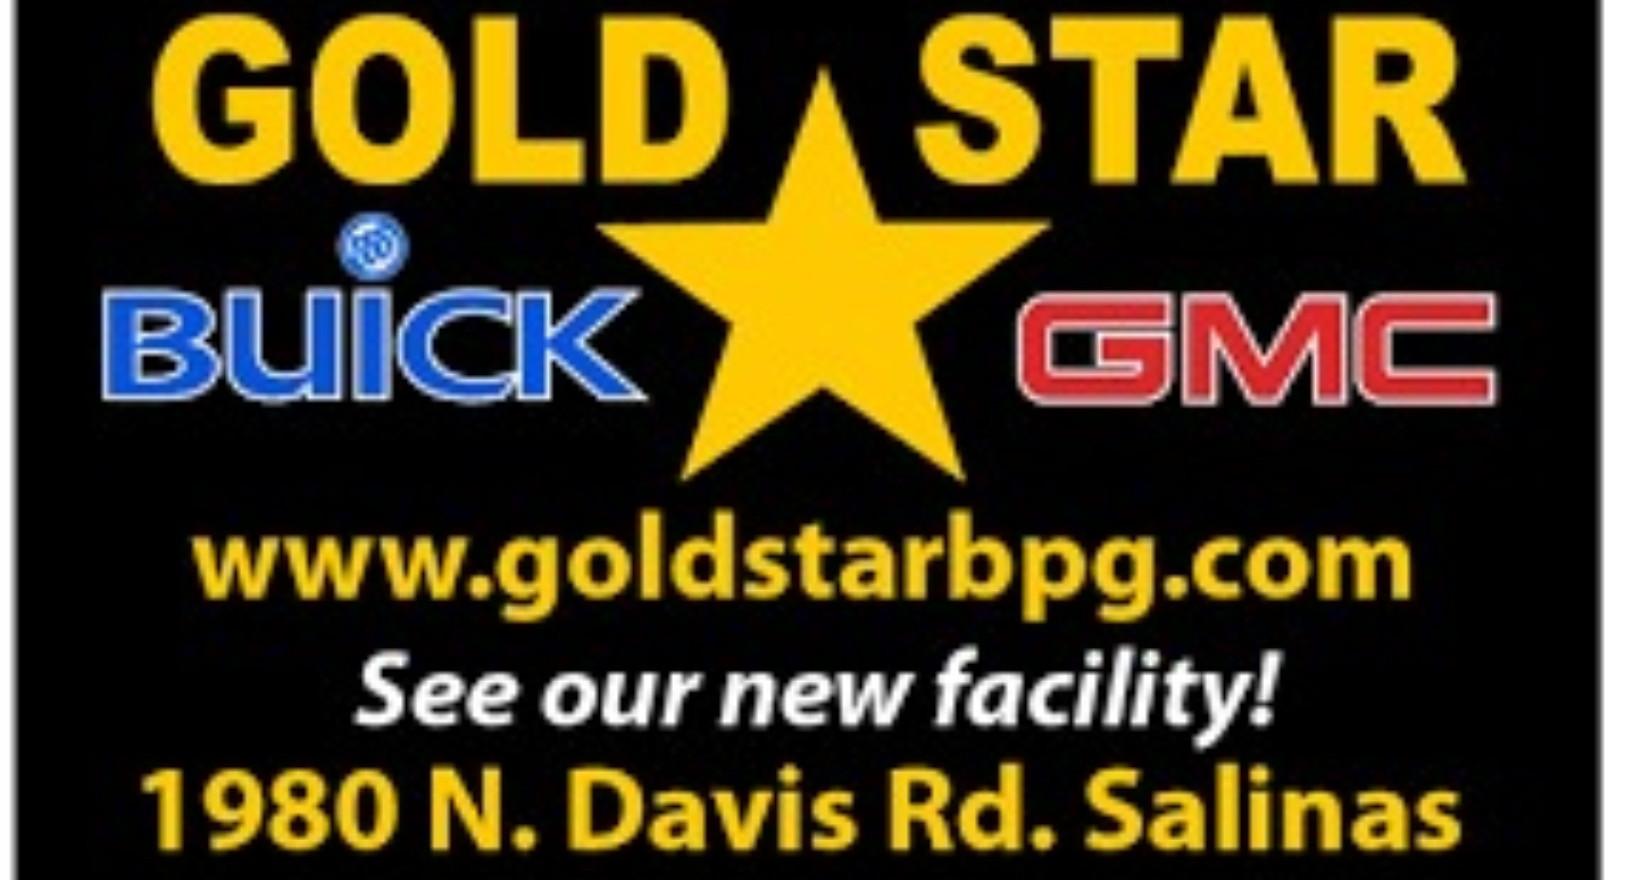 Gold Star Buick GMC